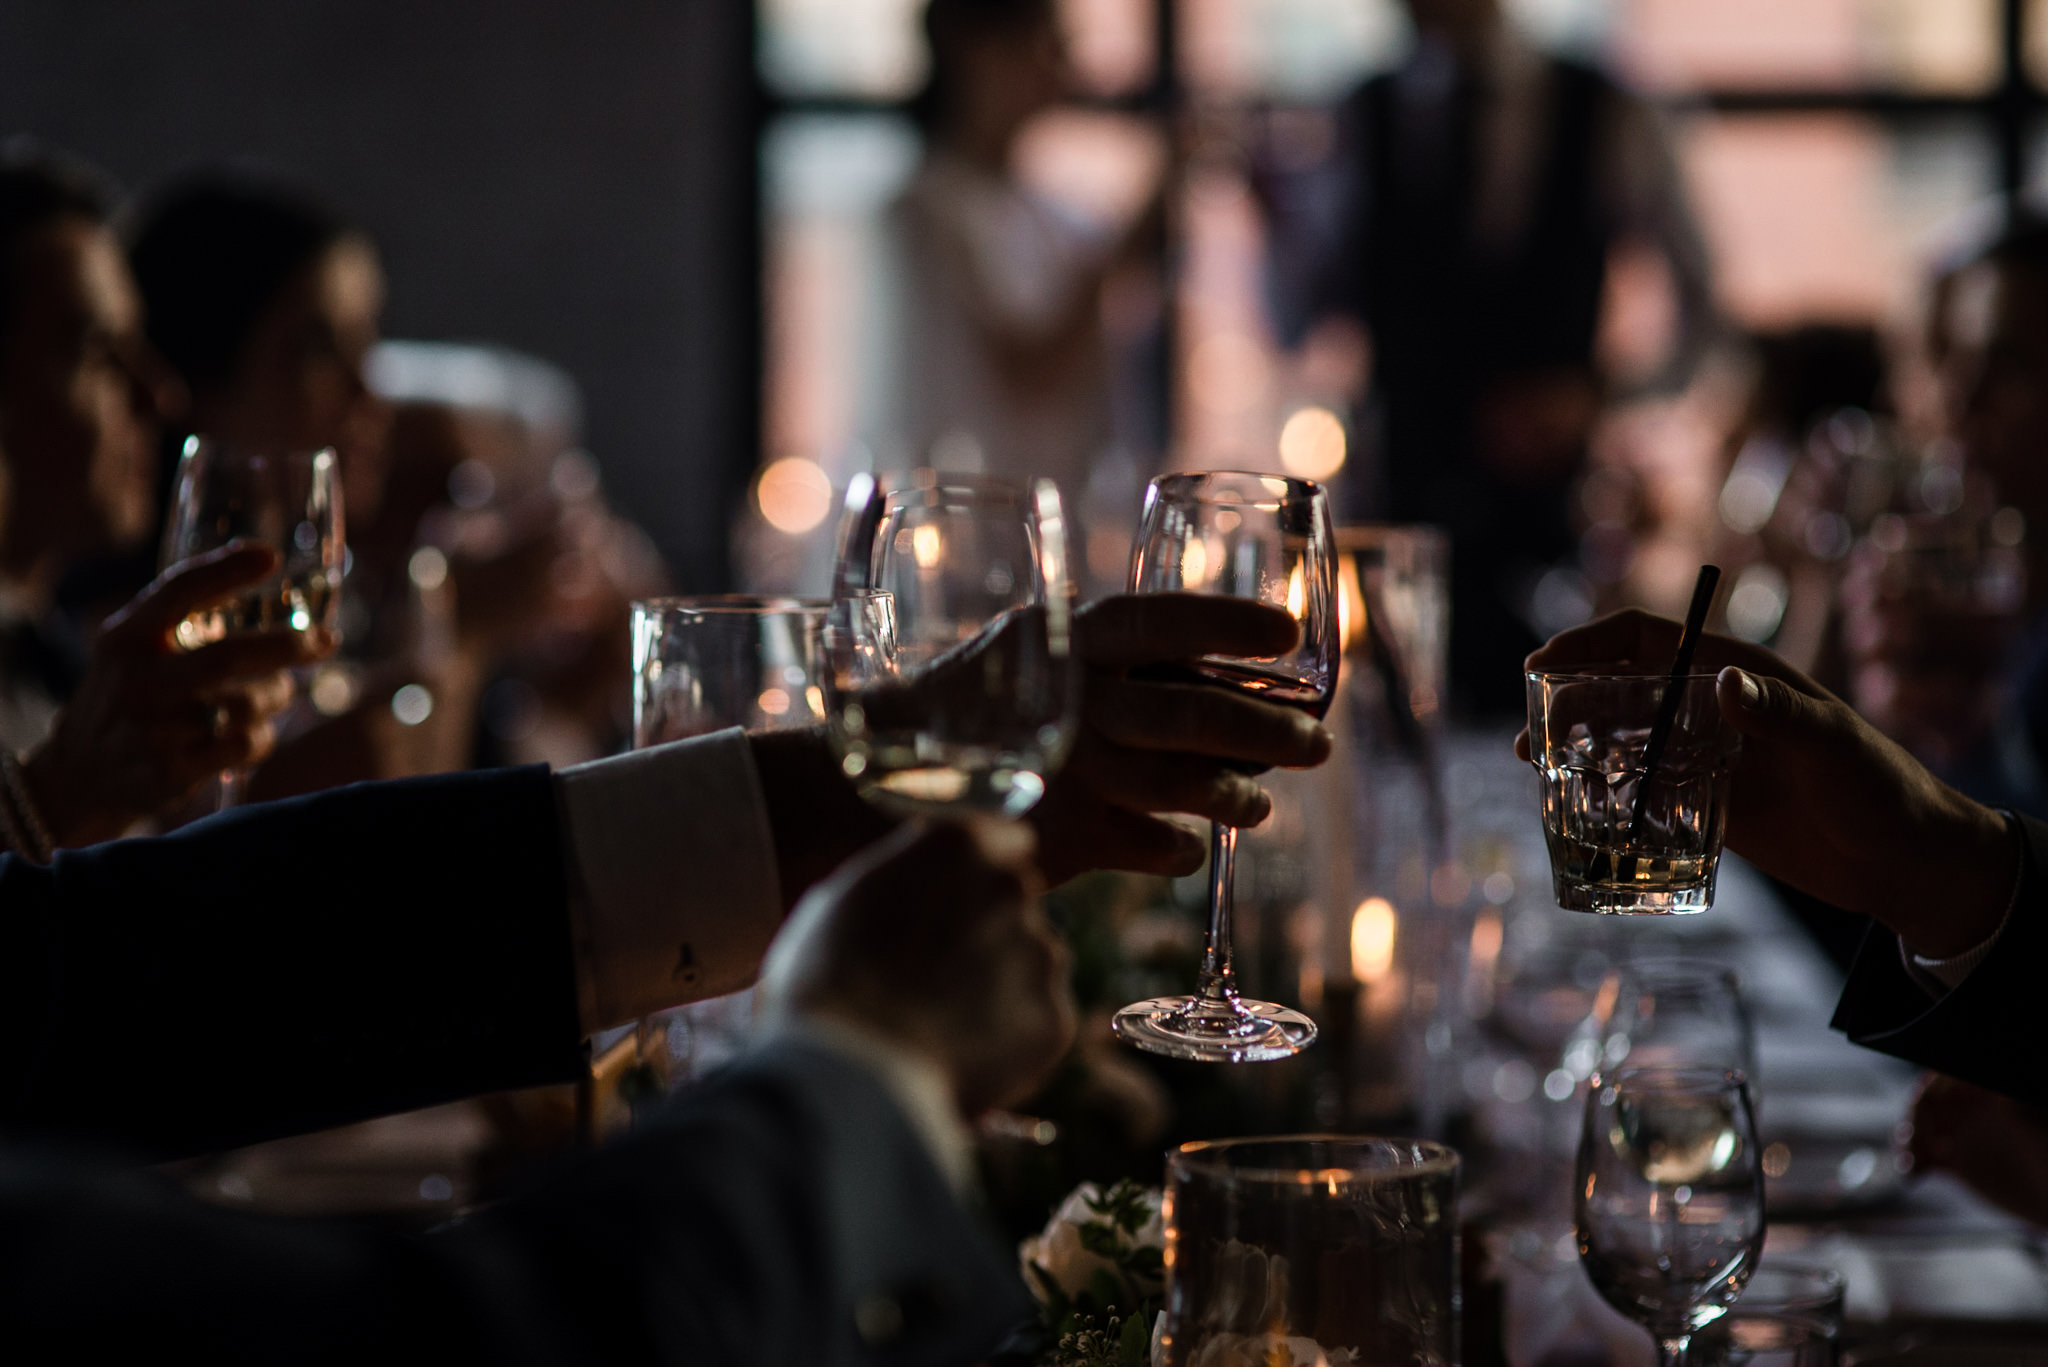 075-guests-candids-documentary-wedding-photographer-reception-storys-toronto.jpg